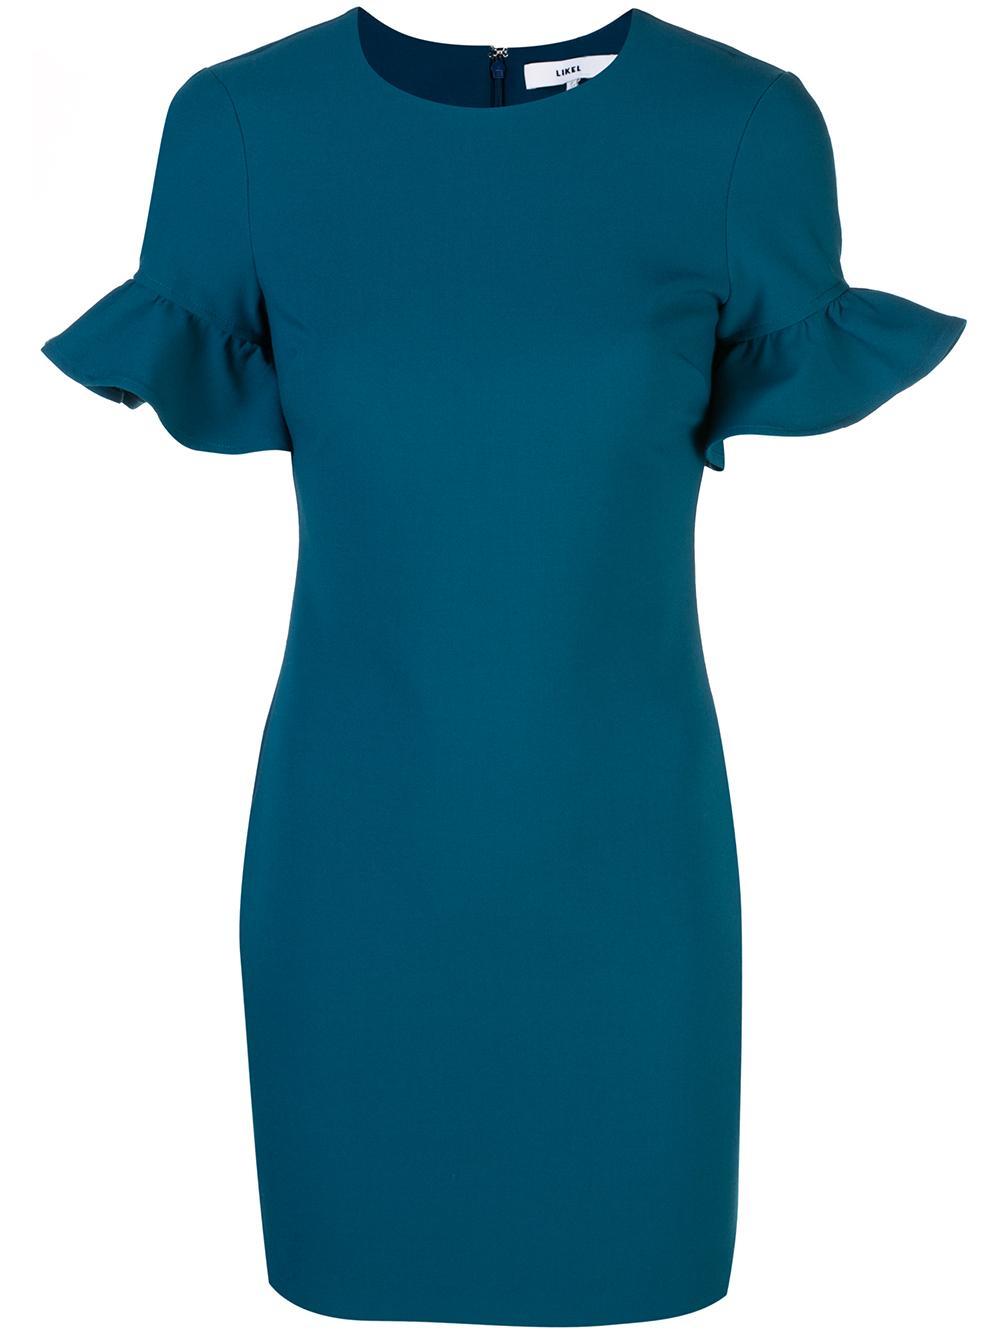 Nico Short Sleeve Ruffle Dress Item # YD980001LYB